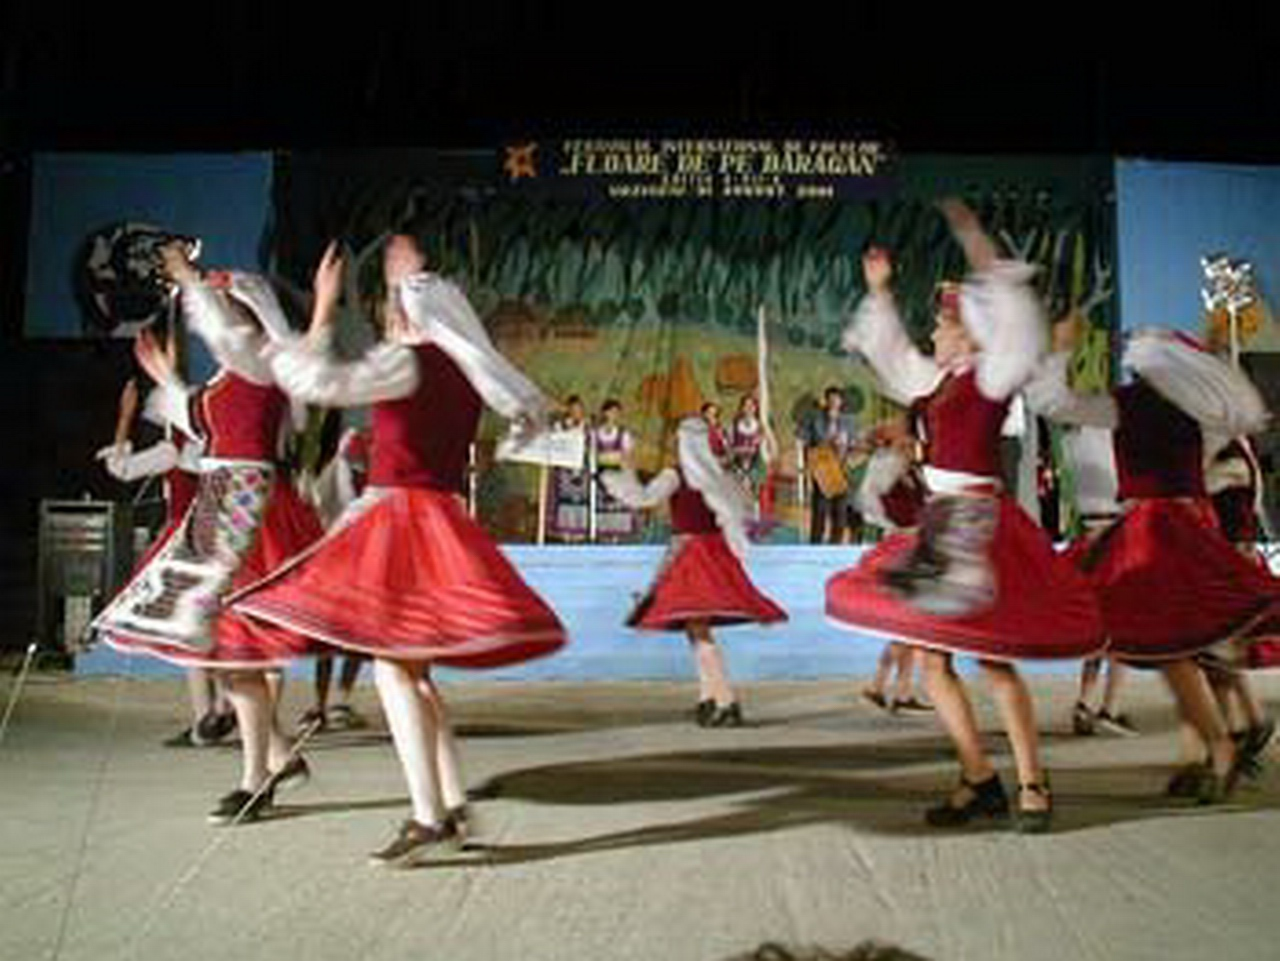 2001 - Ansamblul folcloric \'\'Makamliicheta\'\' - Bulgaria